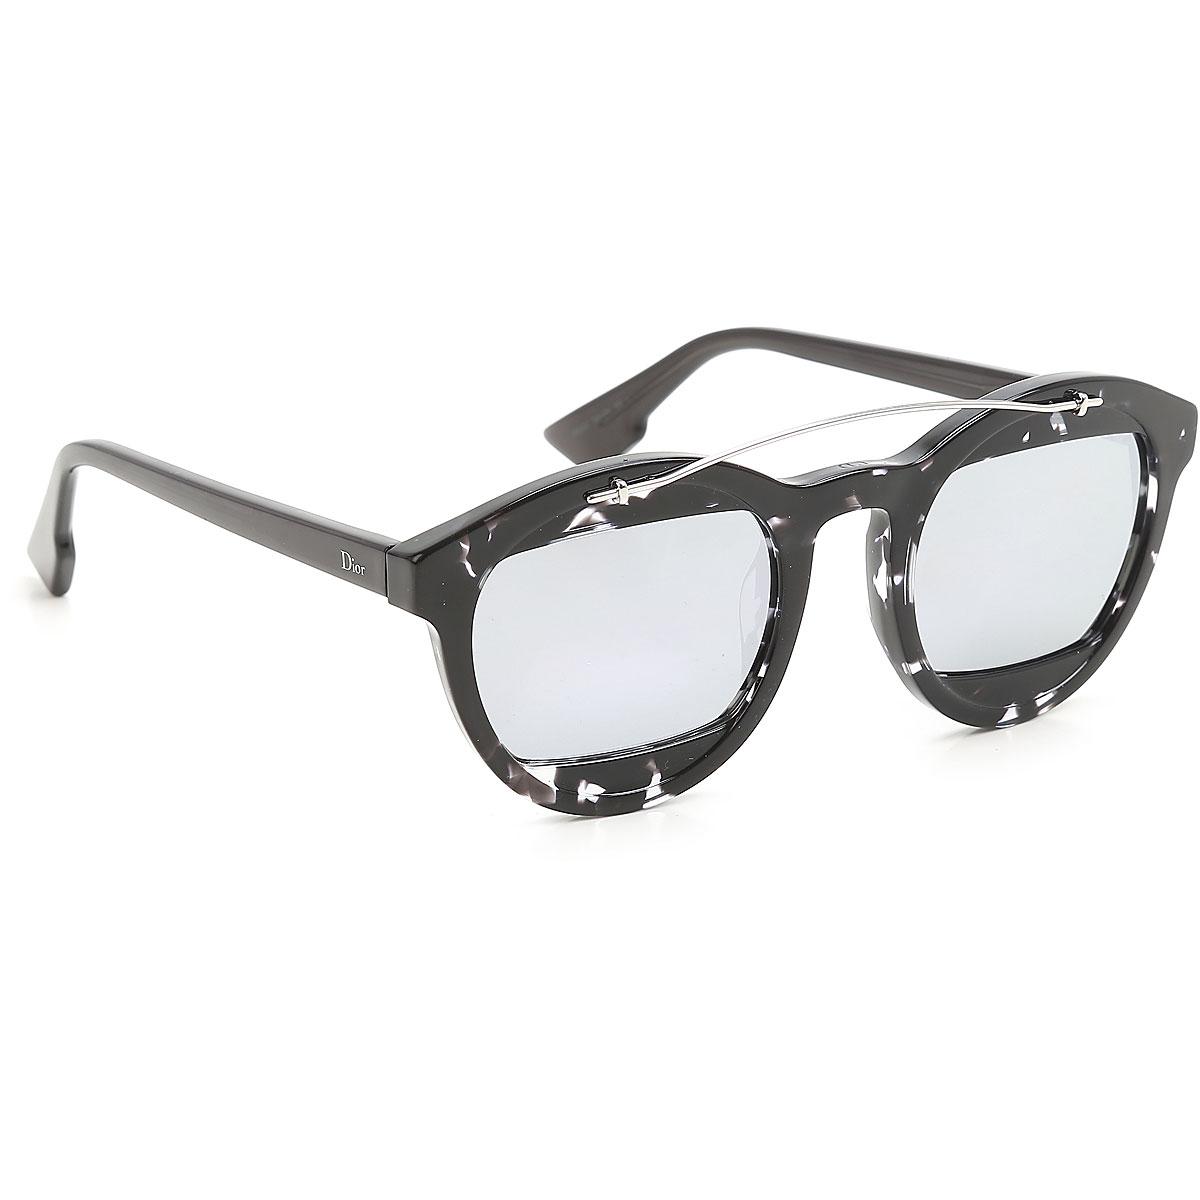 Christian Dior Sunglasses On Sale, Black Havana, 2019